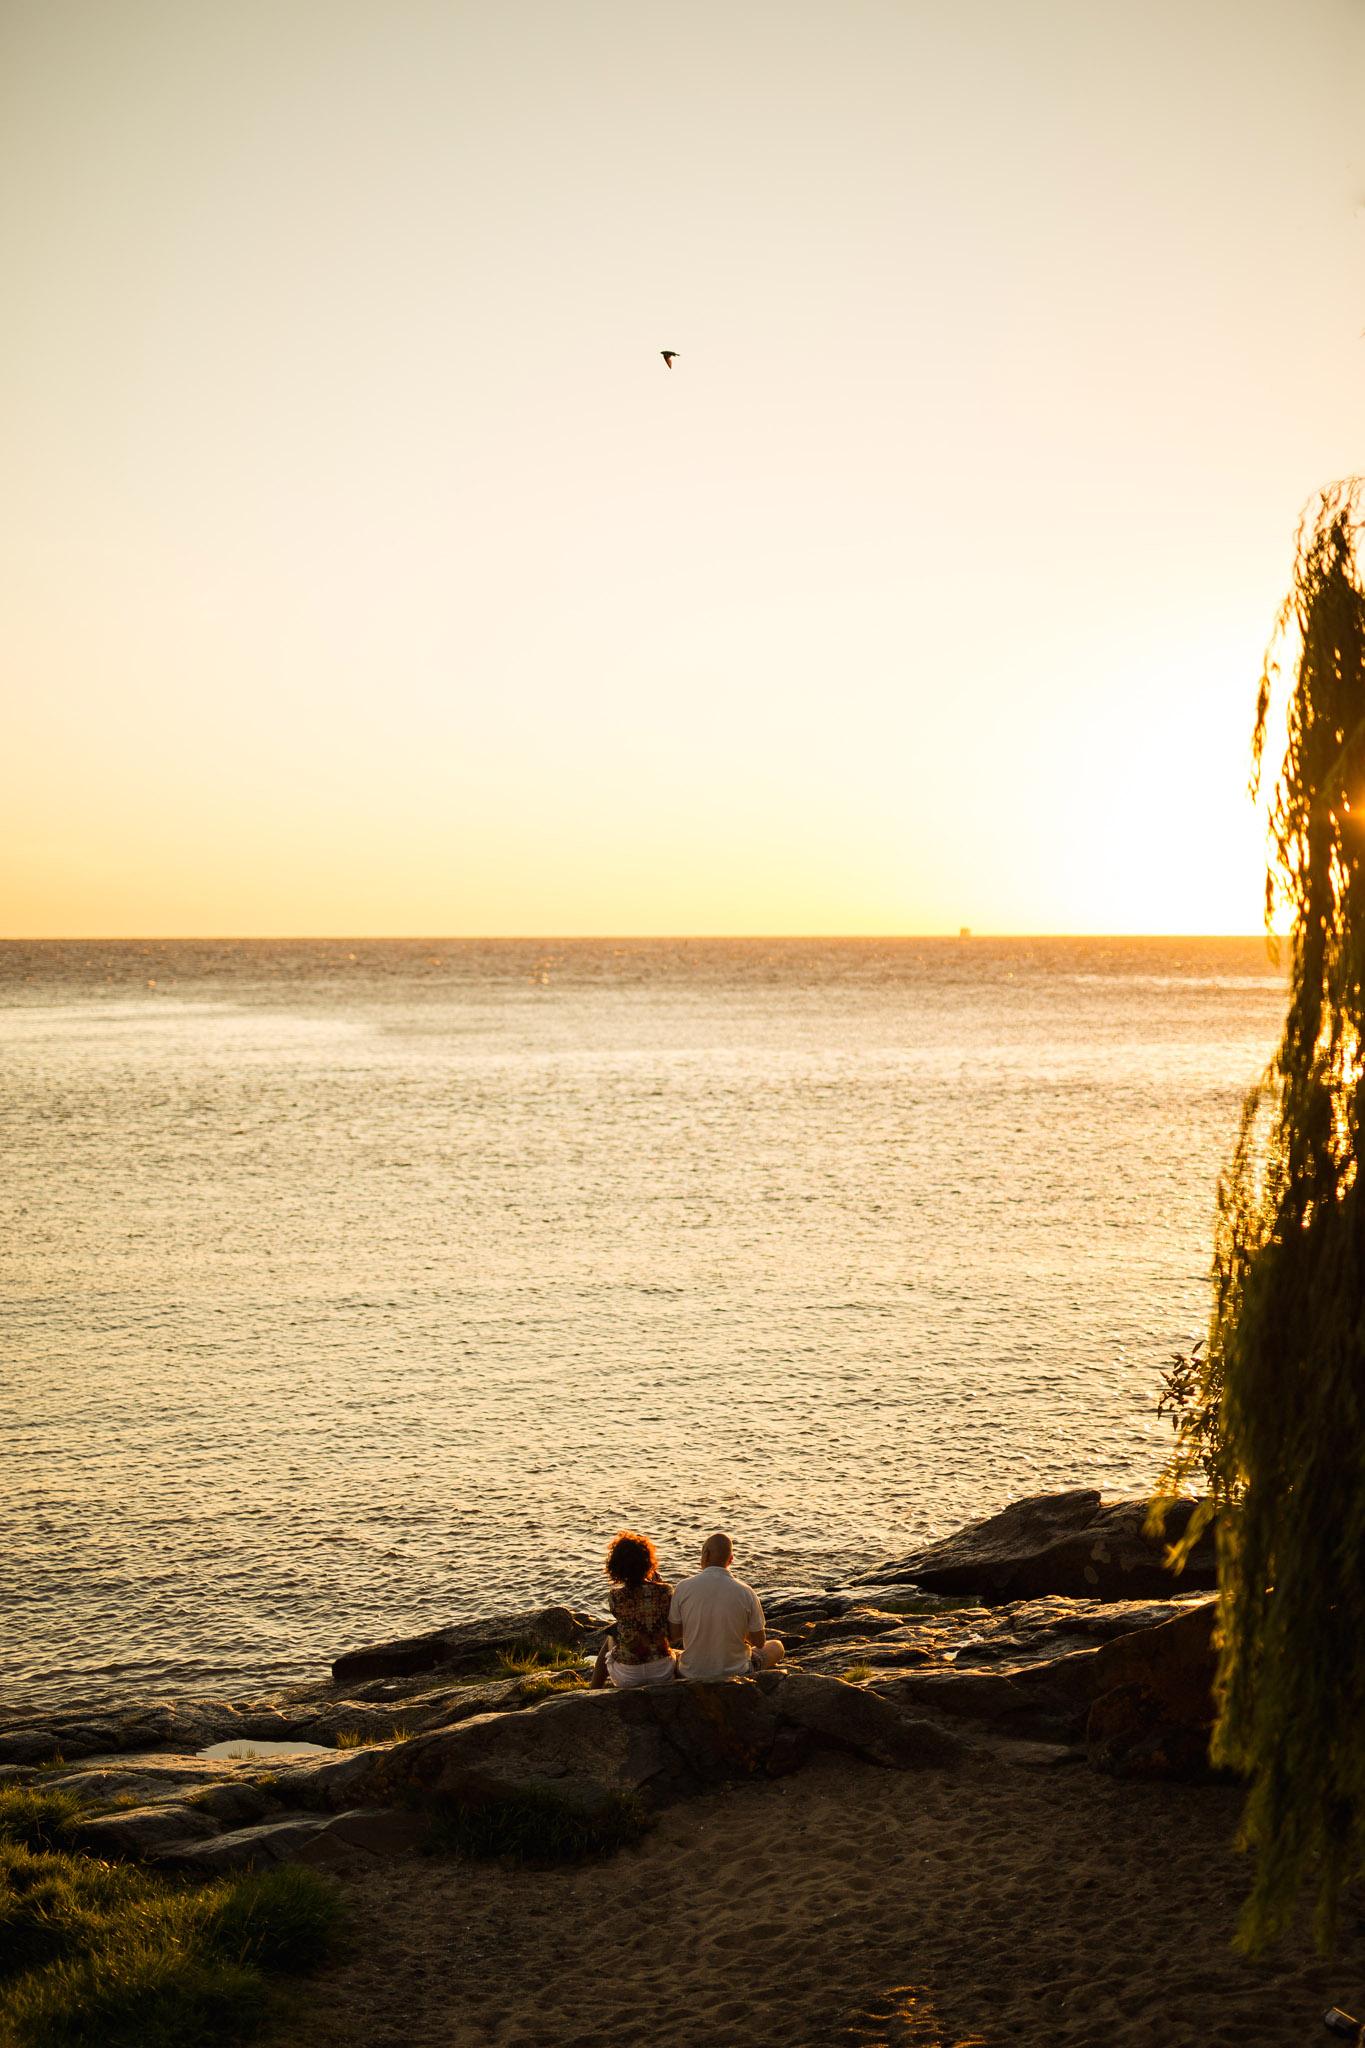 wedding-travellers-destination-photography-overlanding-south-america-uruguay-colonia-del-sacramento-sunset-couple